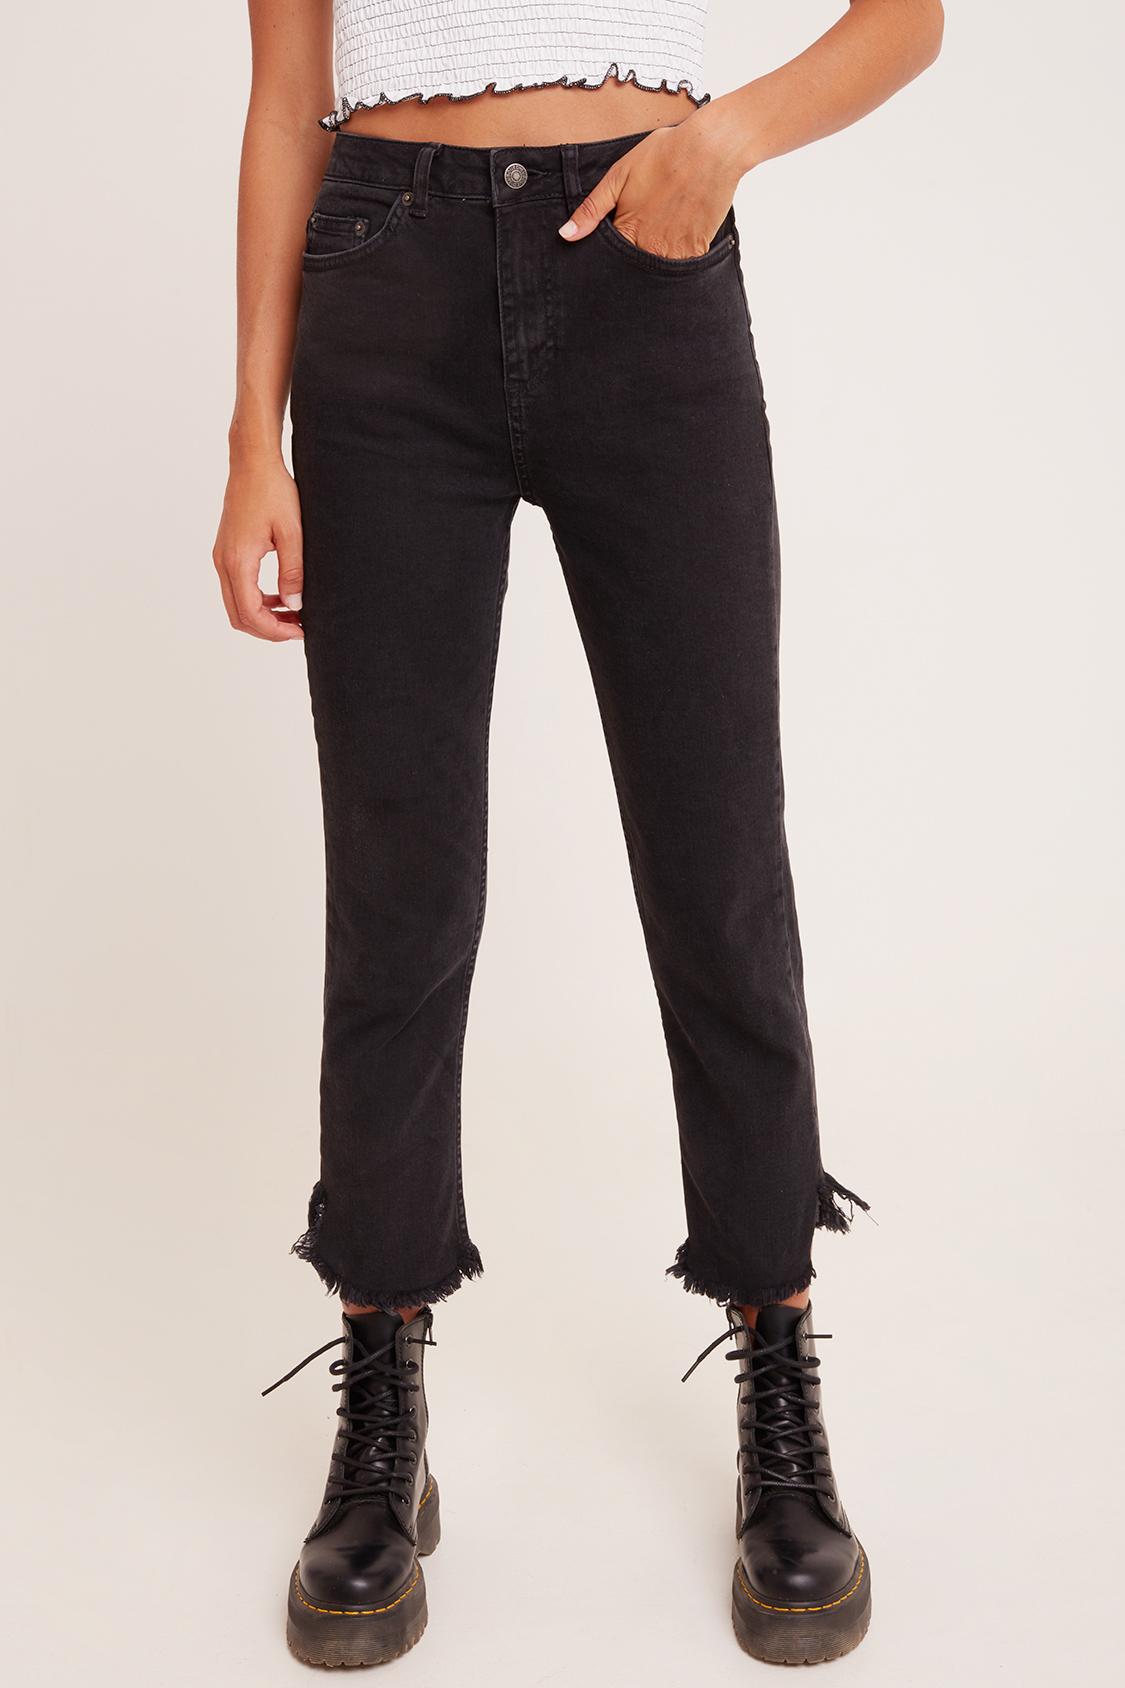 Fringed cigarette jeans